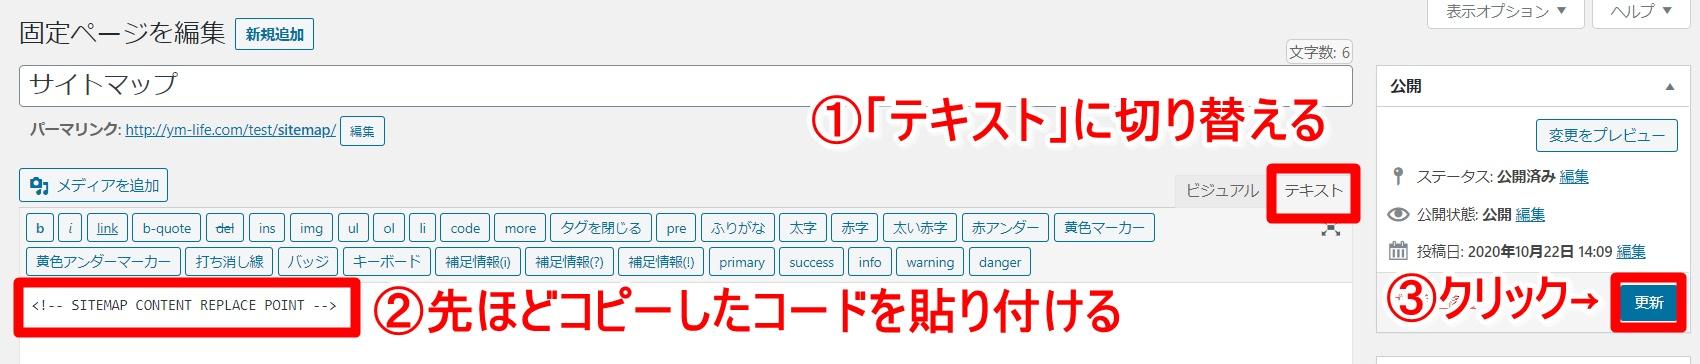 PS Auto Sitemapの設定方法4